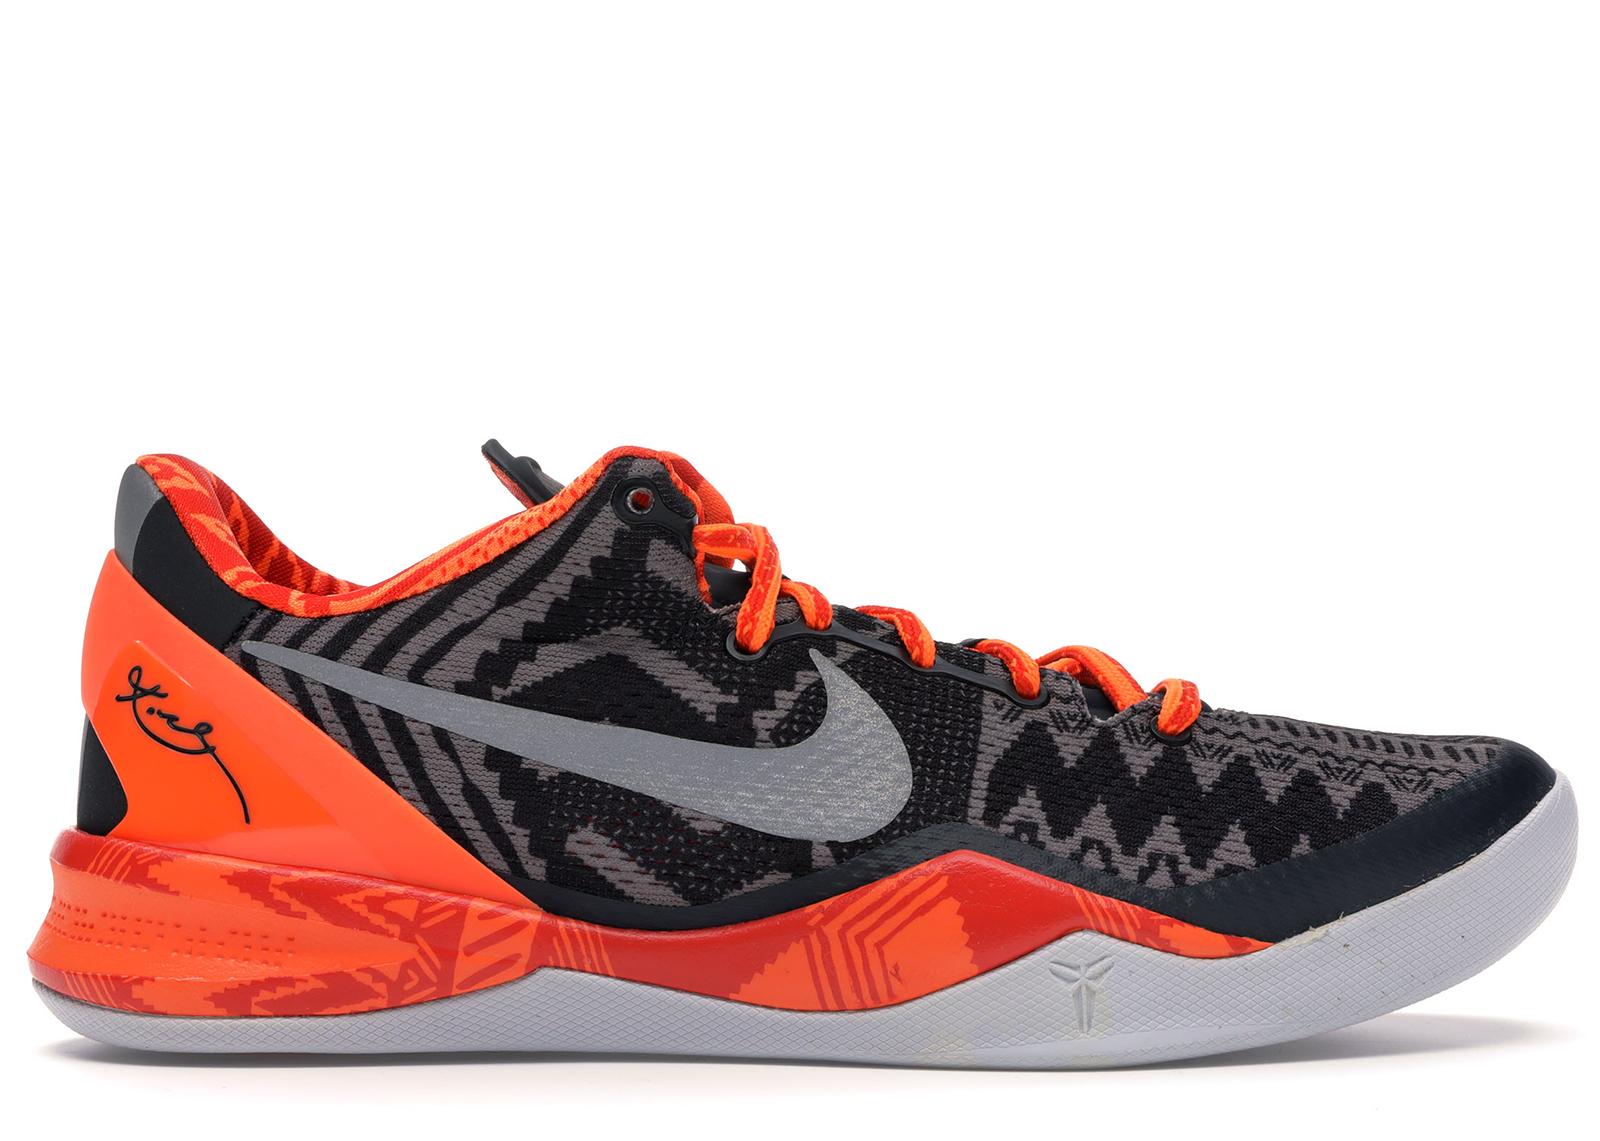 Nike Kobe 8 Black History Month - 583112-001